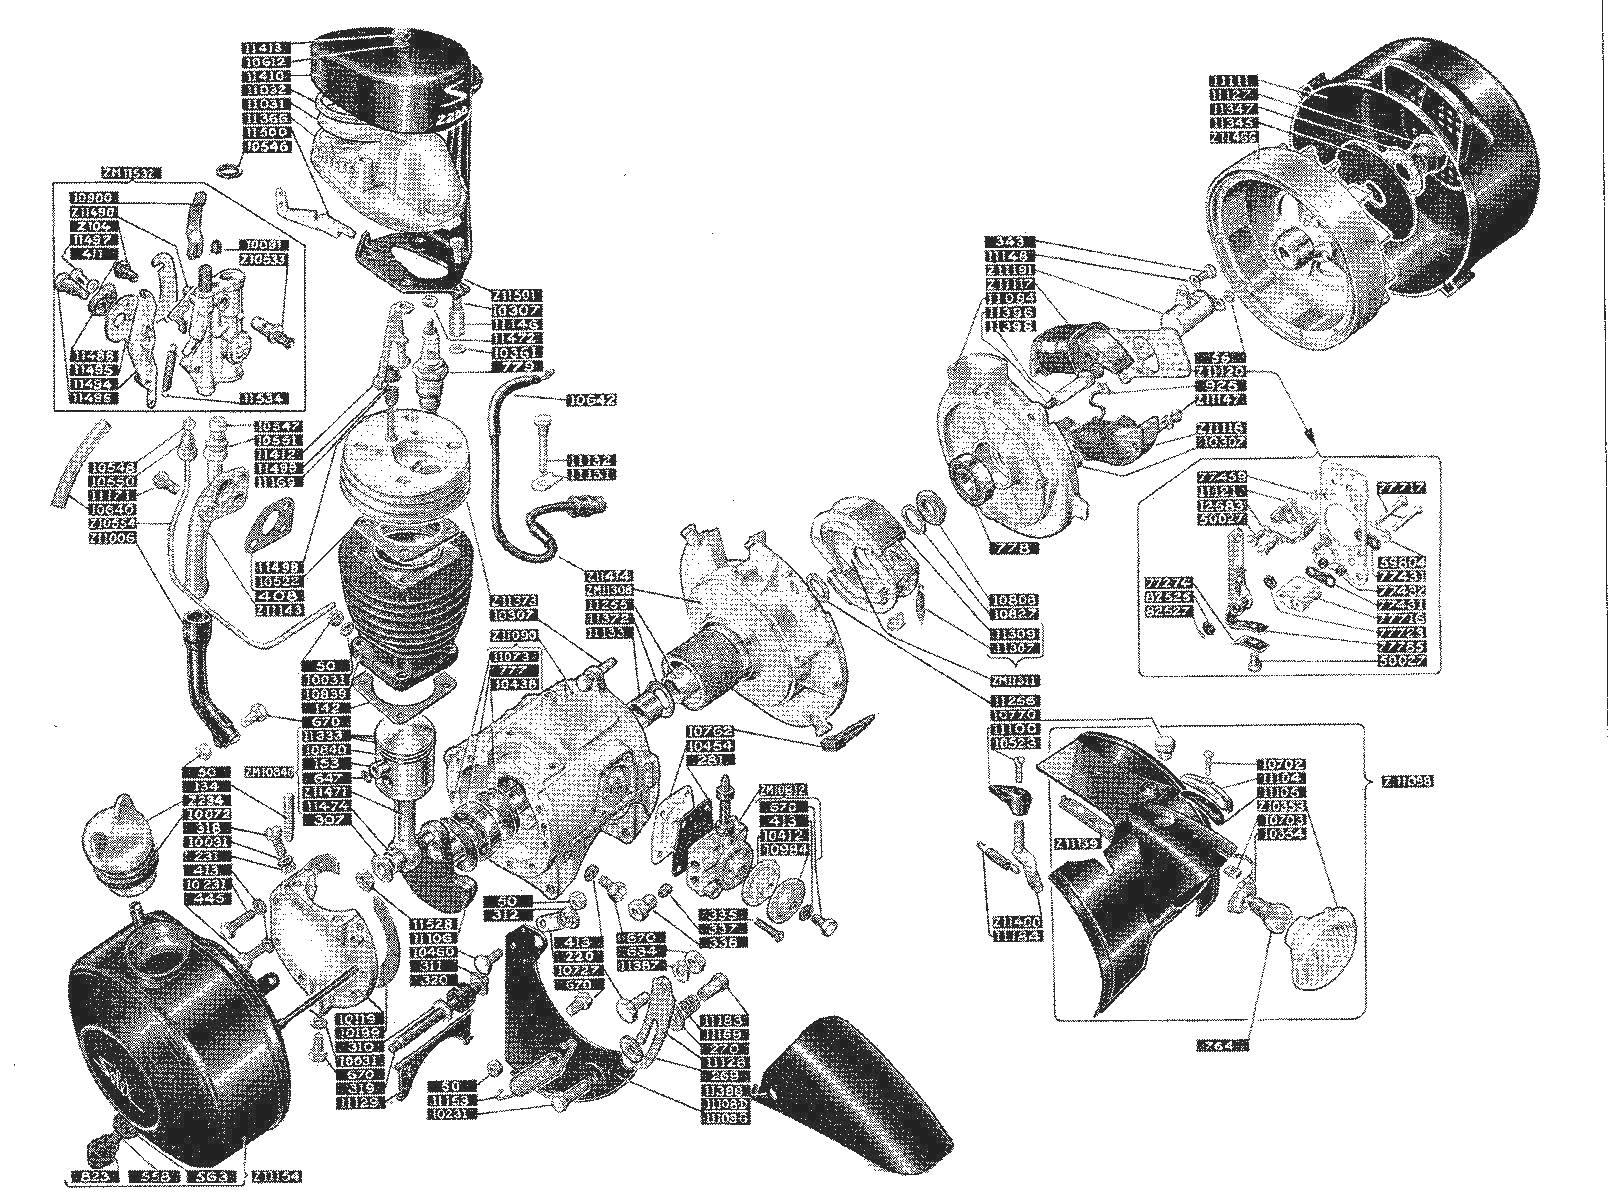 Motor model 2200